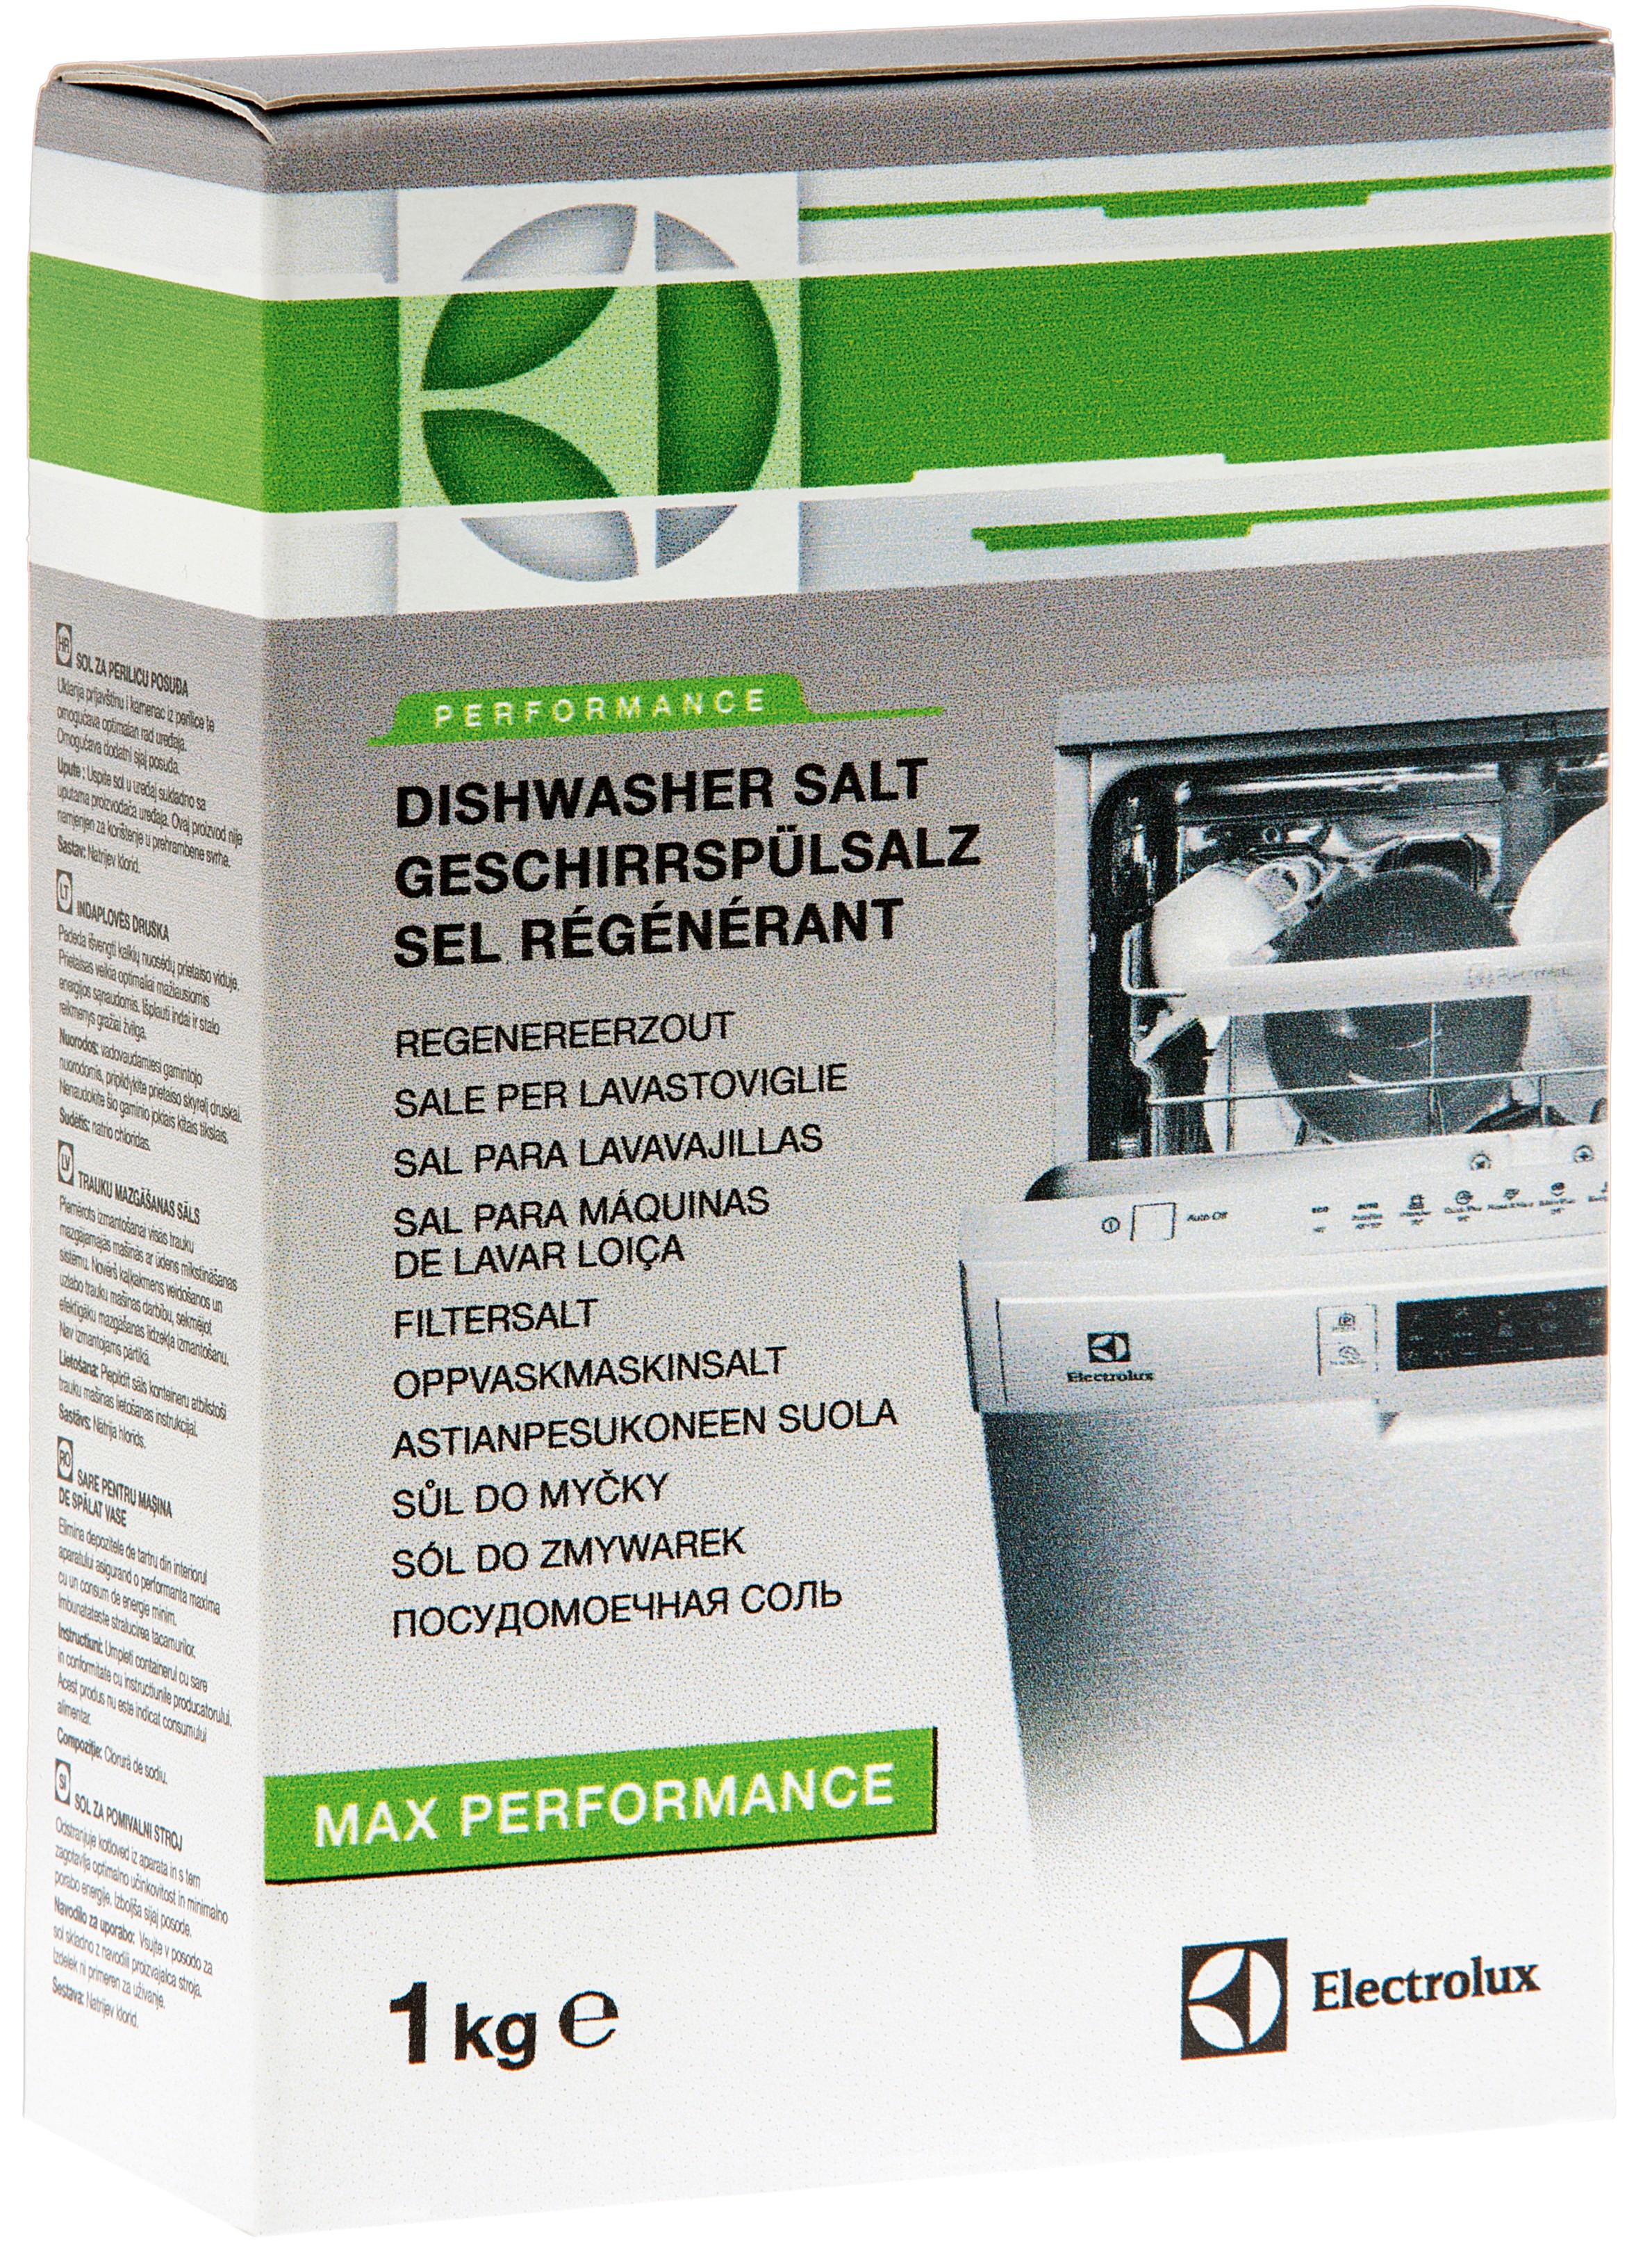 ELECSALT : Electrolux salt til oppvaskmaskin 1 kg